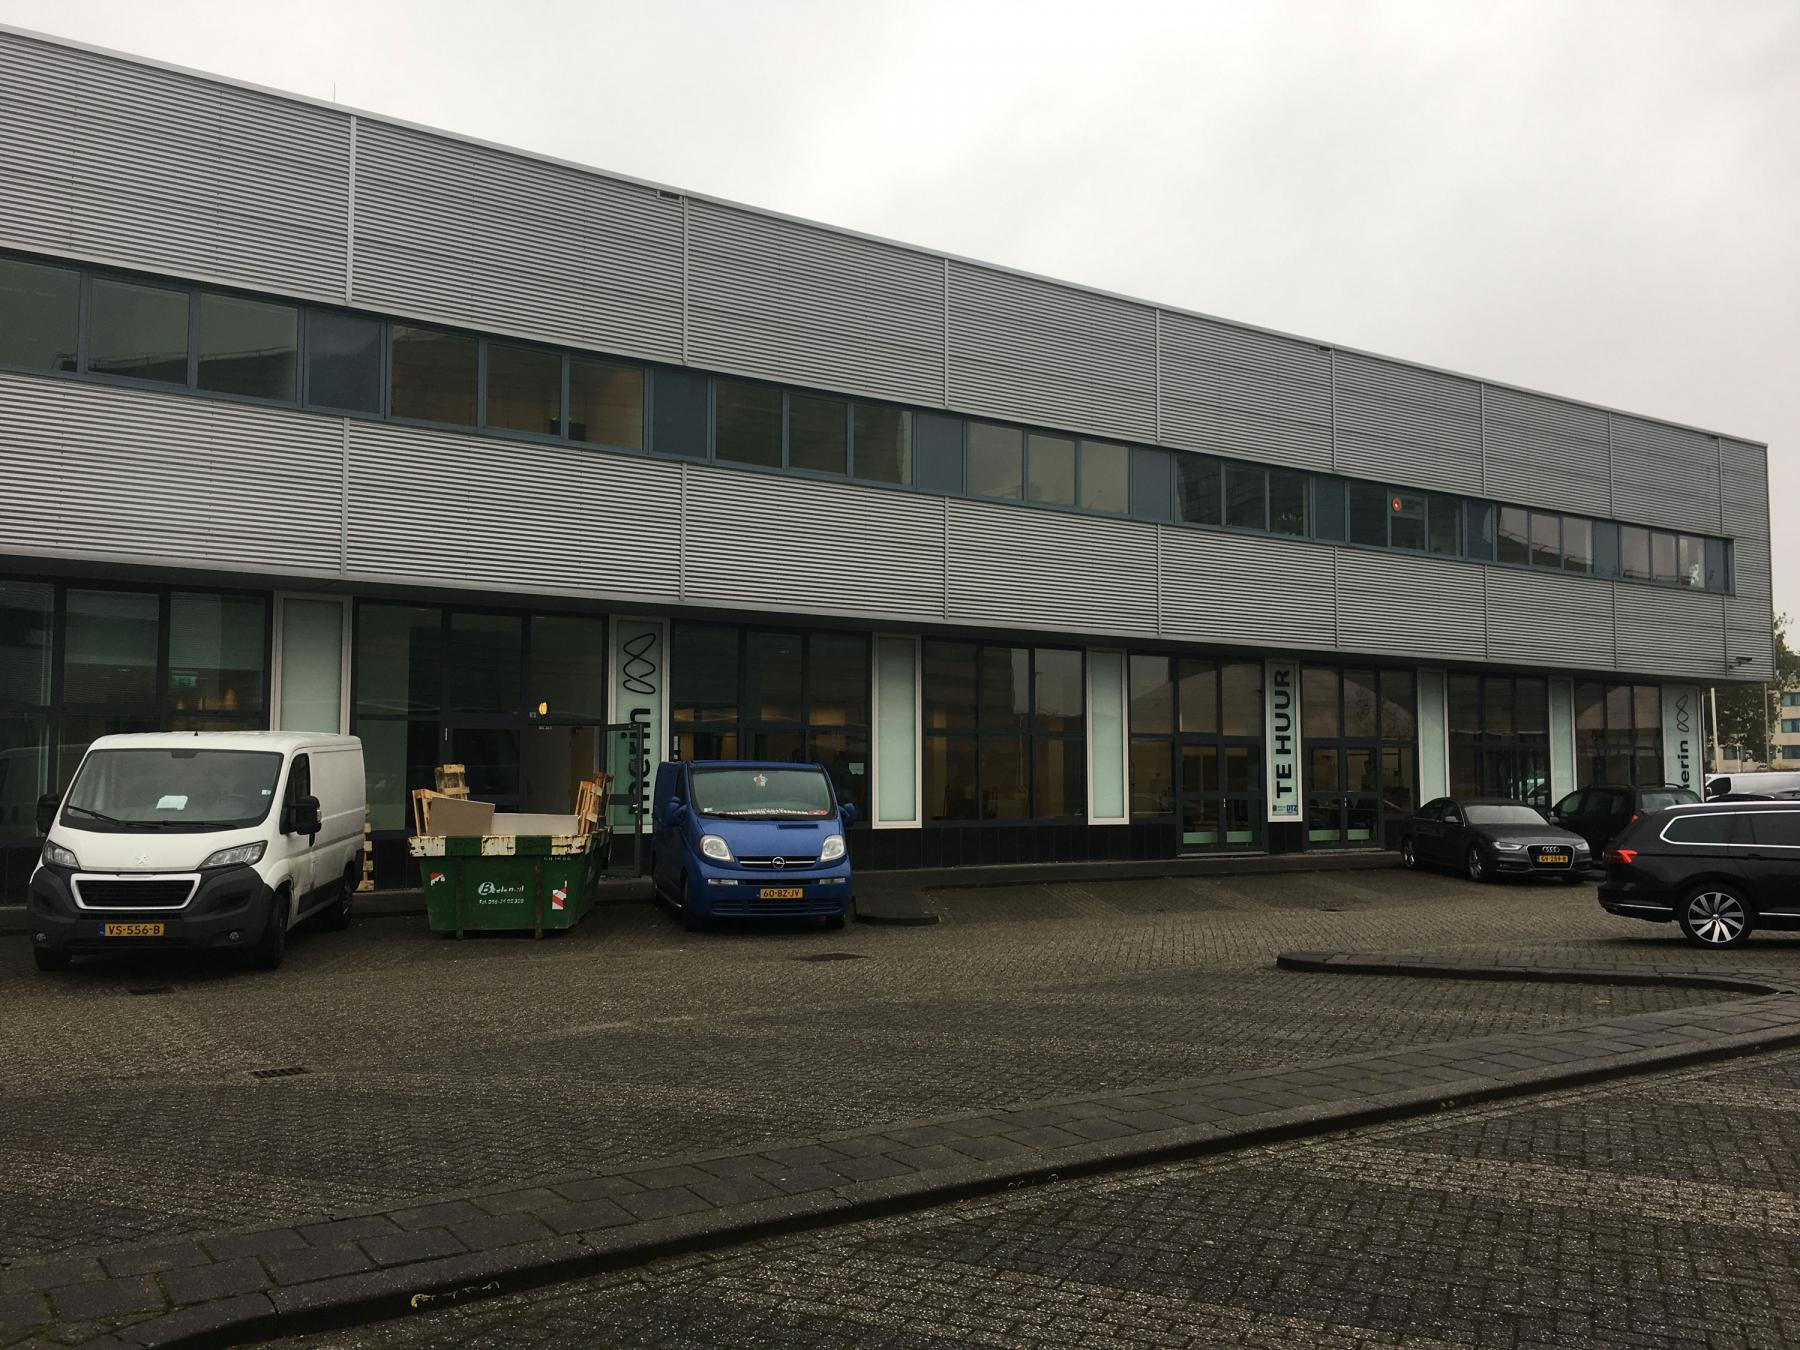 kantoorgebouw capelle rotterdam rivium boulevard parkeerruimte